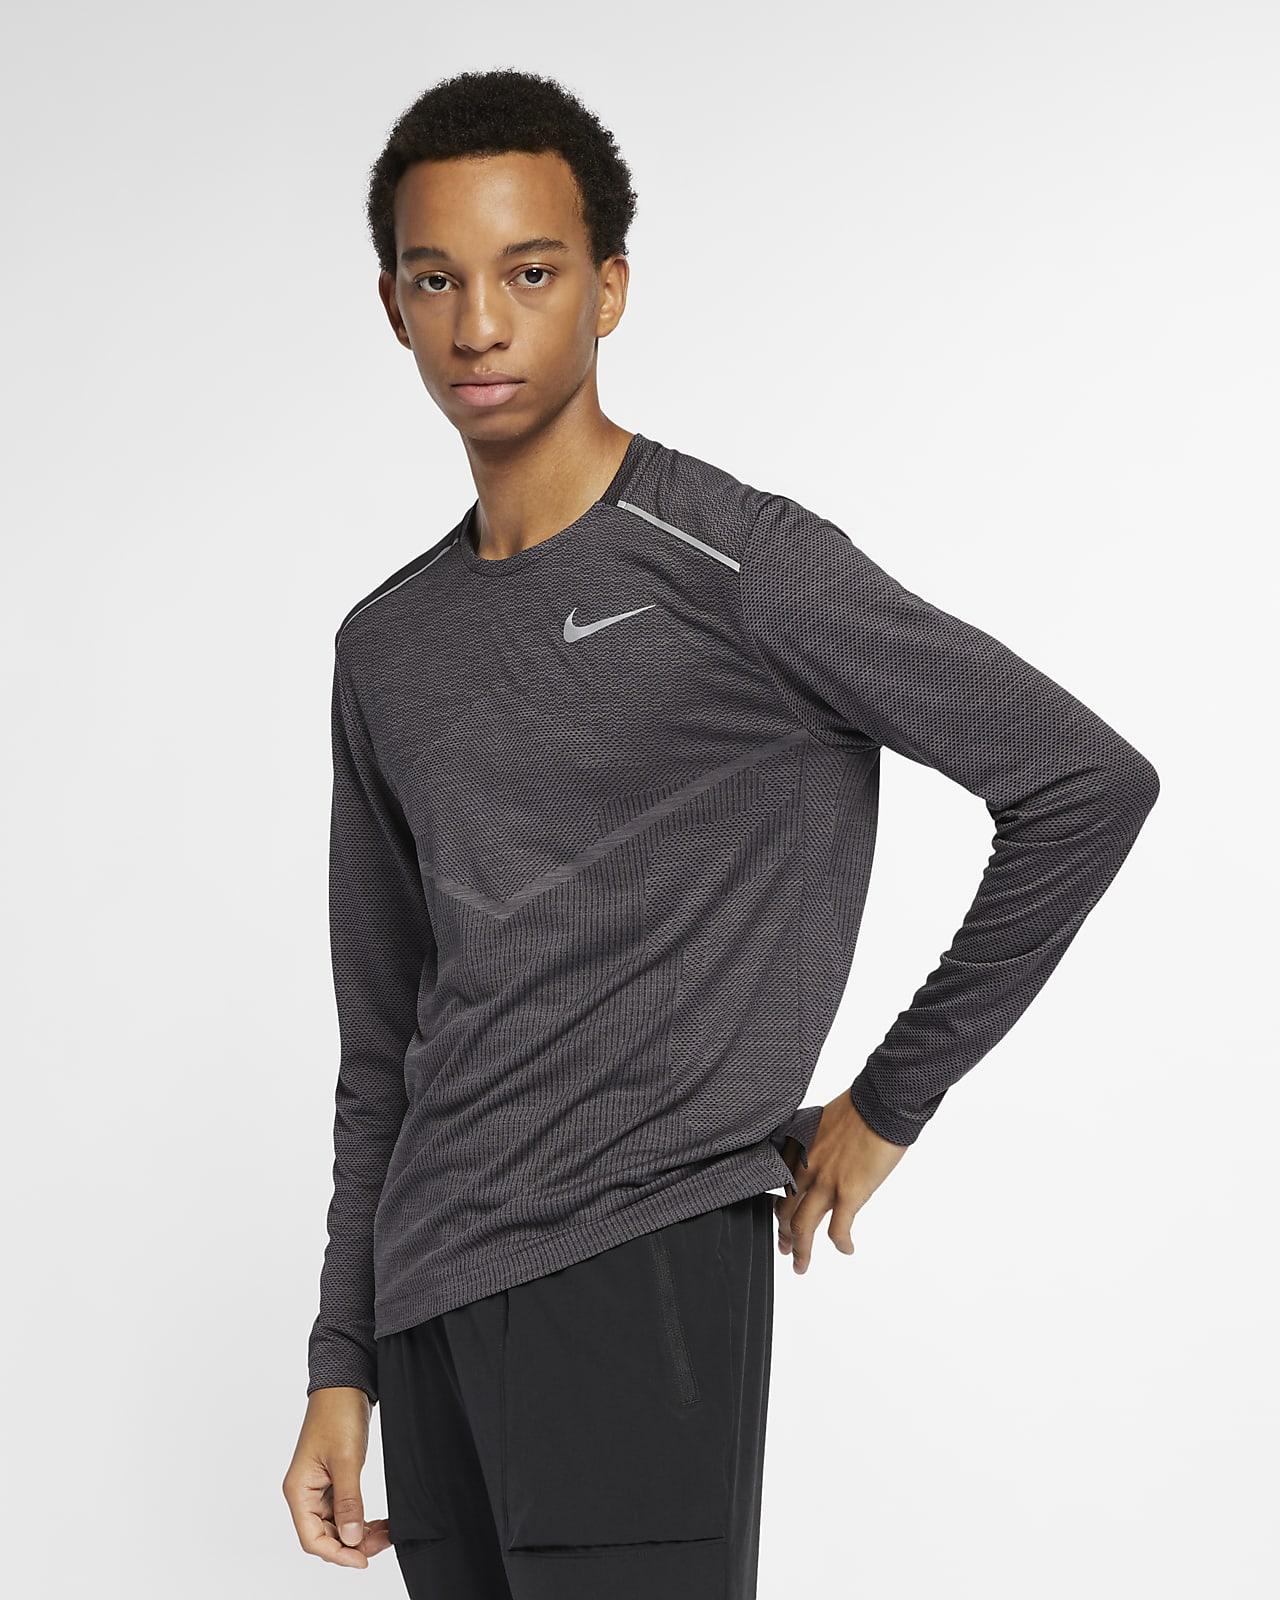 Nike TechKnit Ultra Men's Long-Sleeve